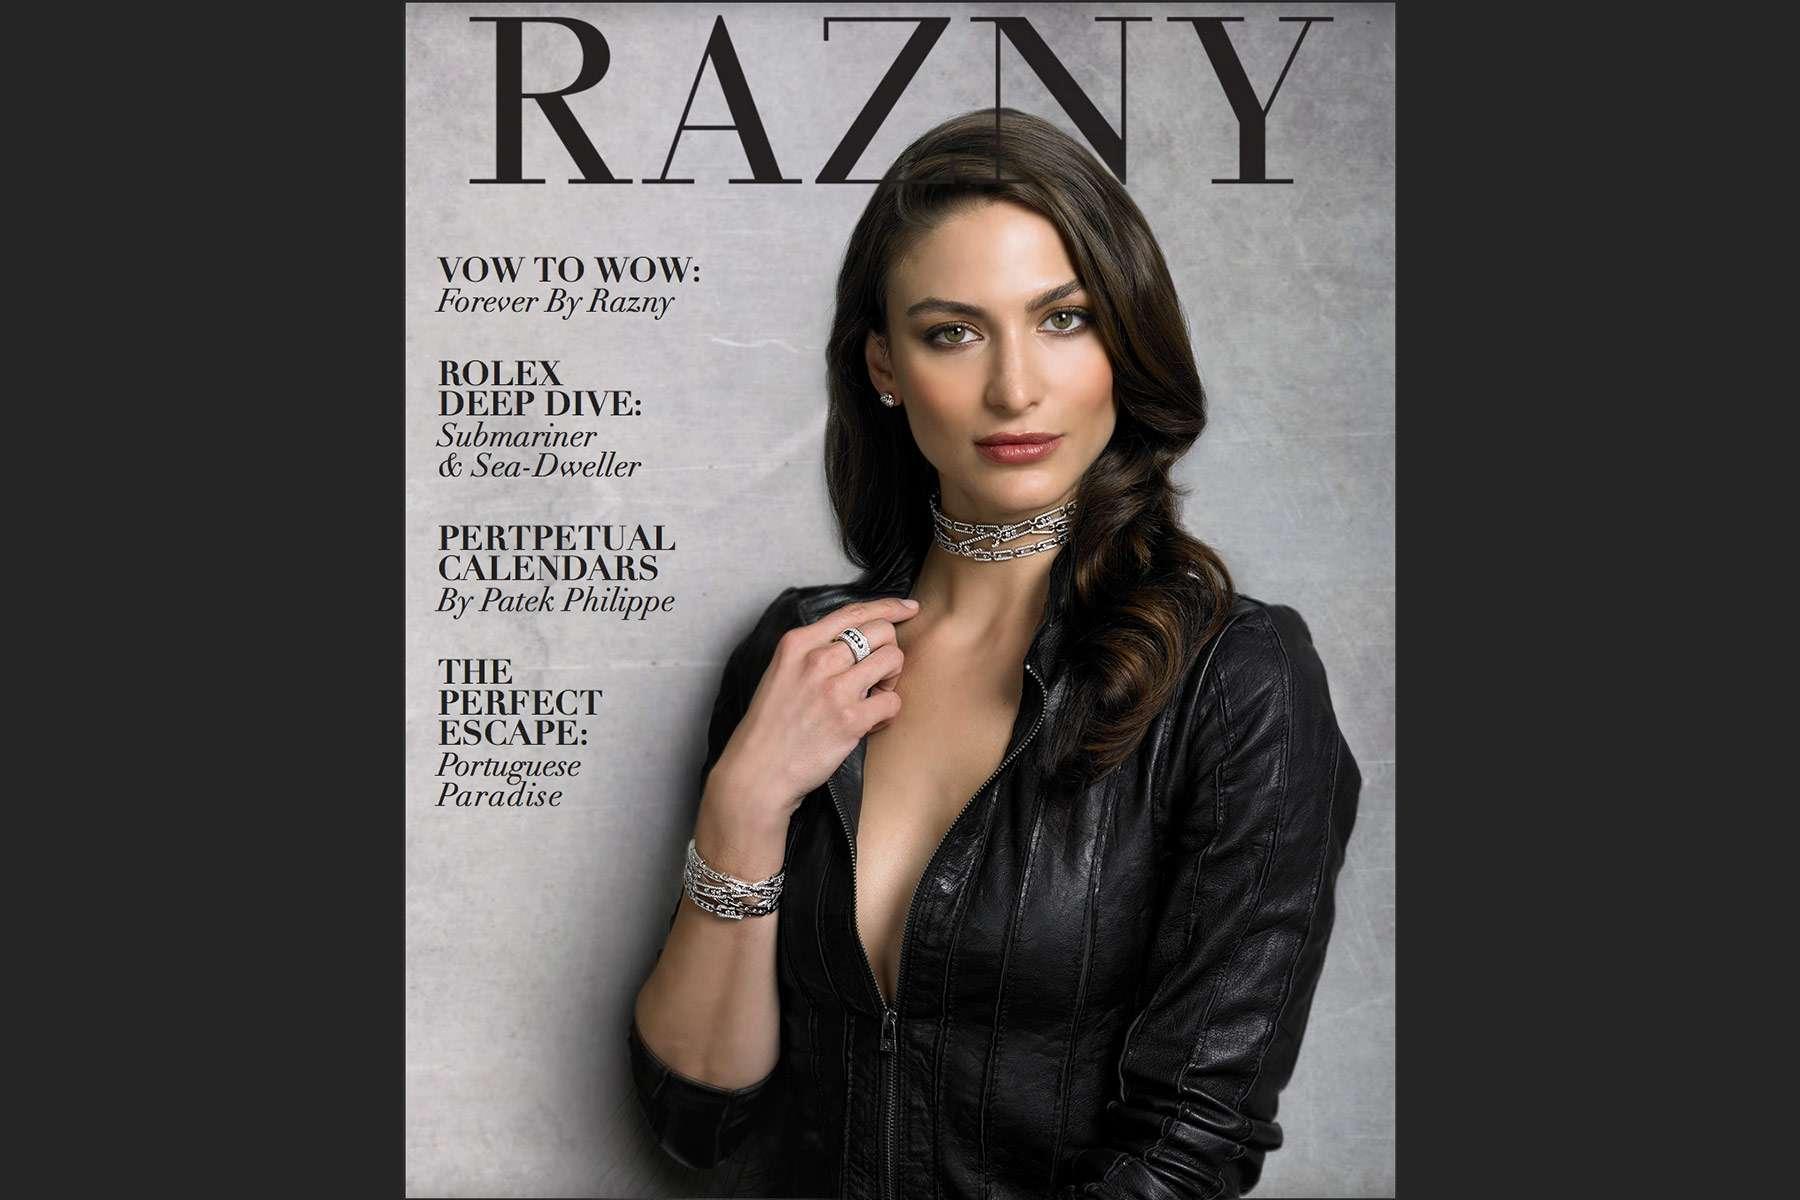 Razny-cover.1.jpg